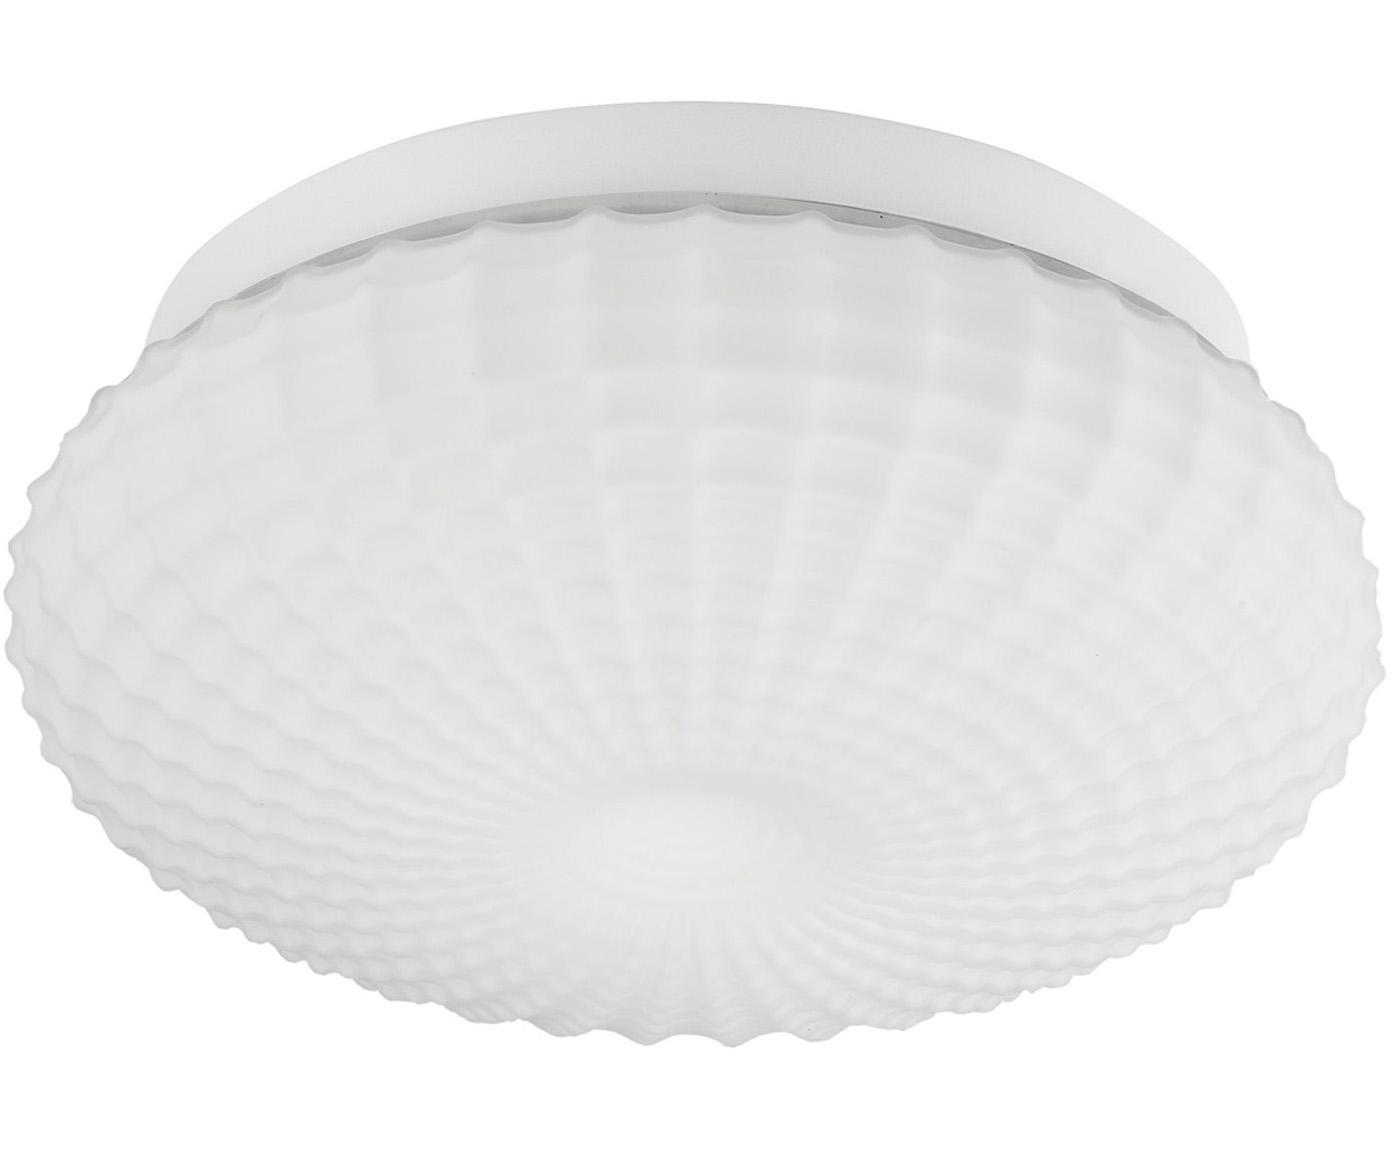 Dimbare plafondlamp Clam van glas, Lampenkap: glas, Baldakijn: gecoat staal, Wit, Ø 30 x H 12 cm